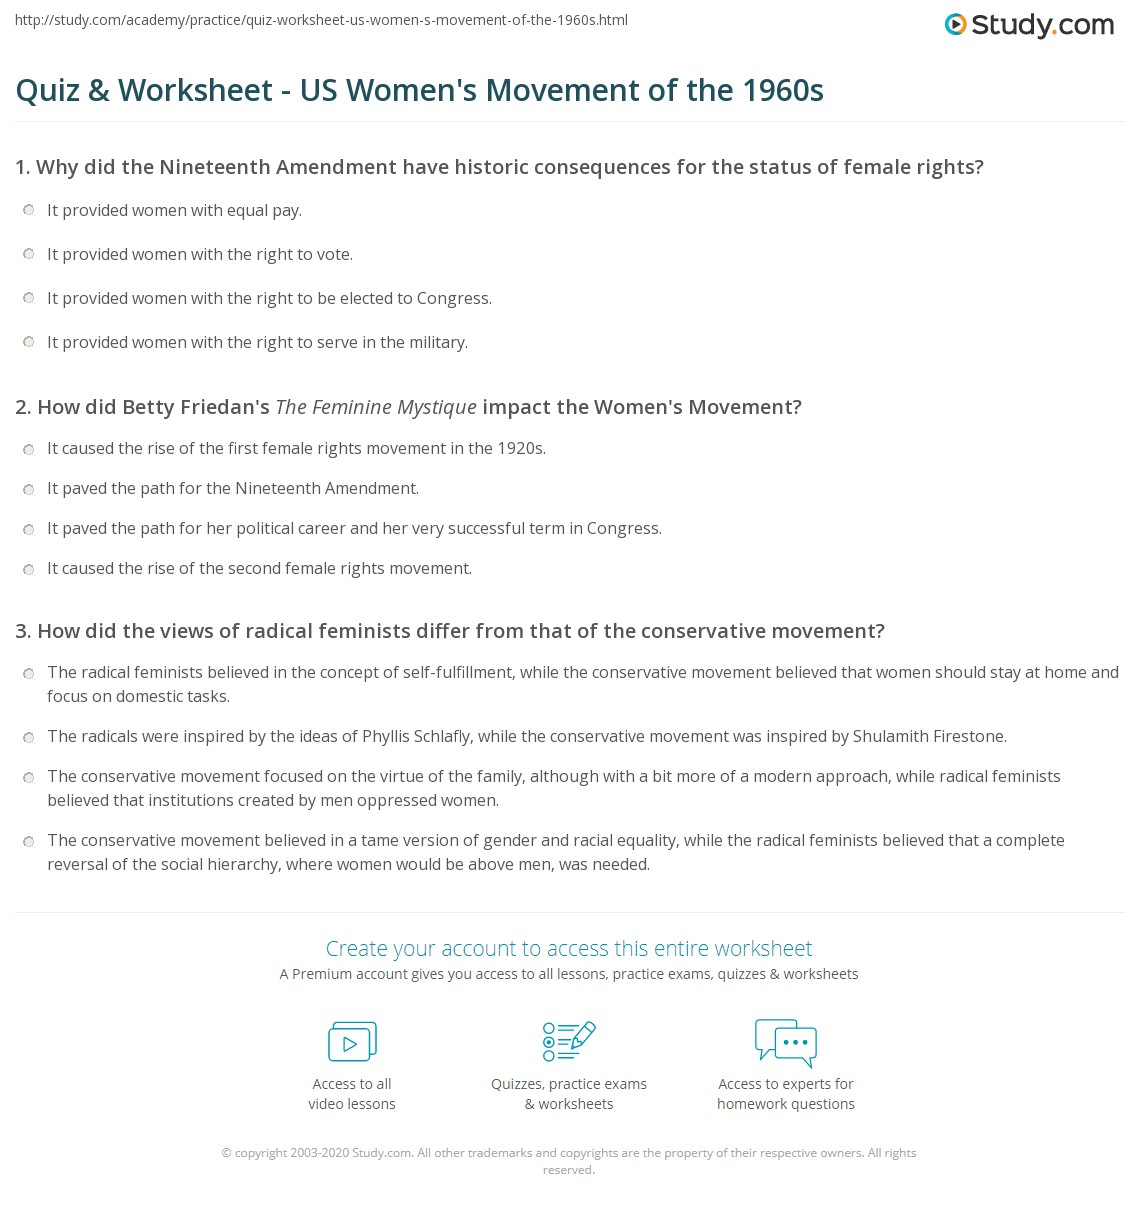 impact of feminist movement